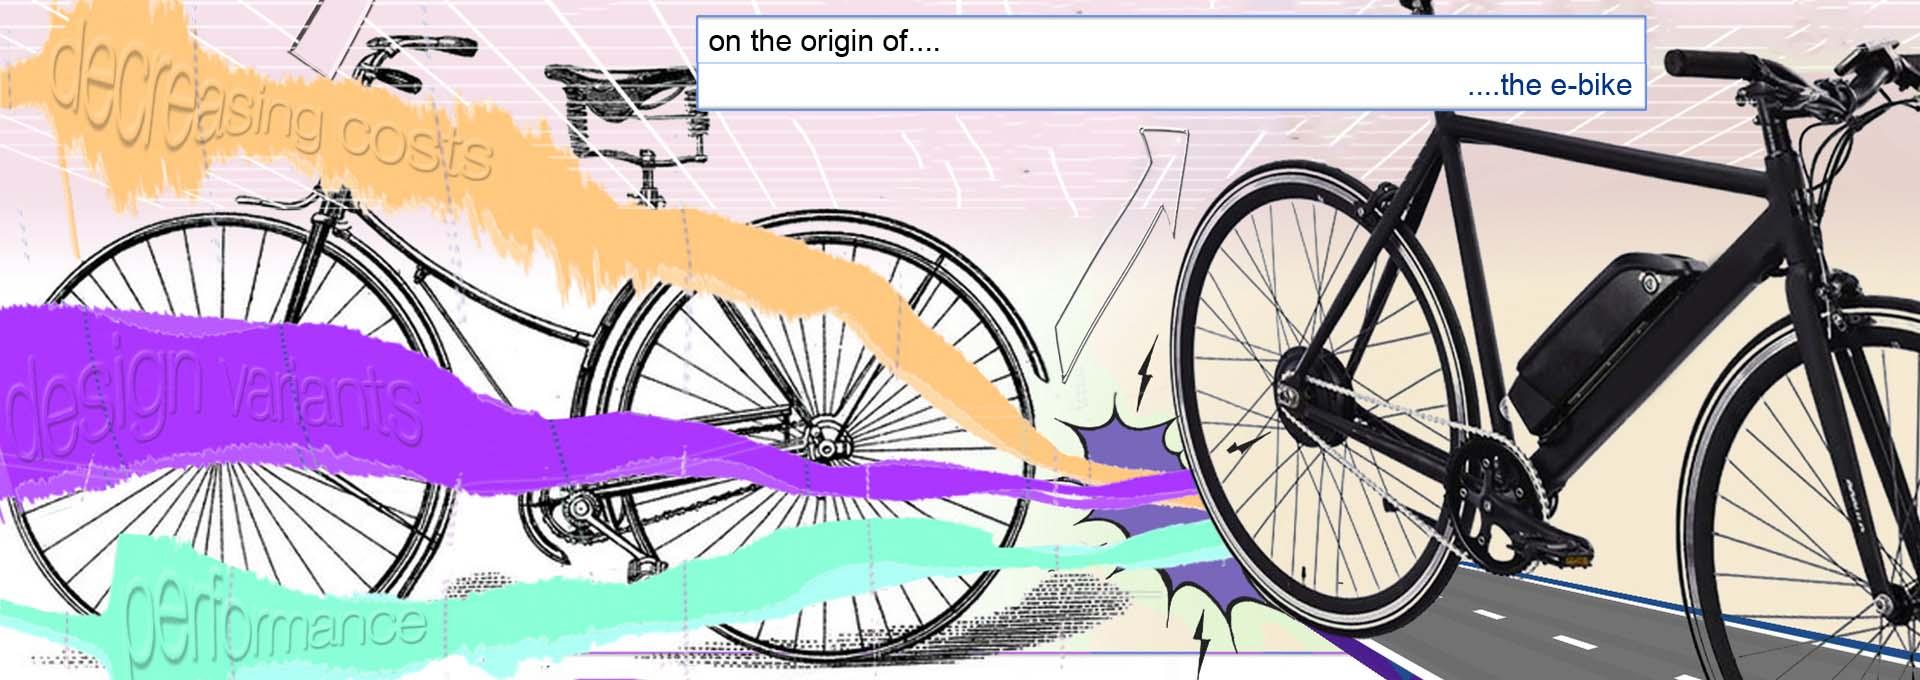 Visual of On the origin of the e-bike